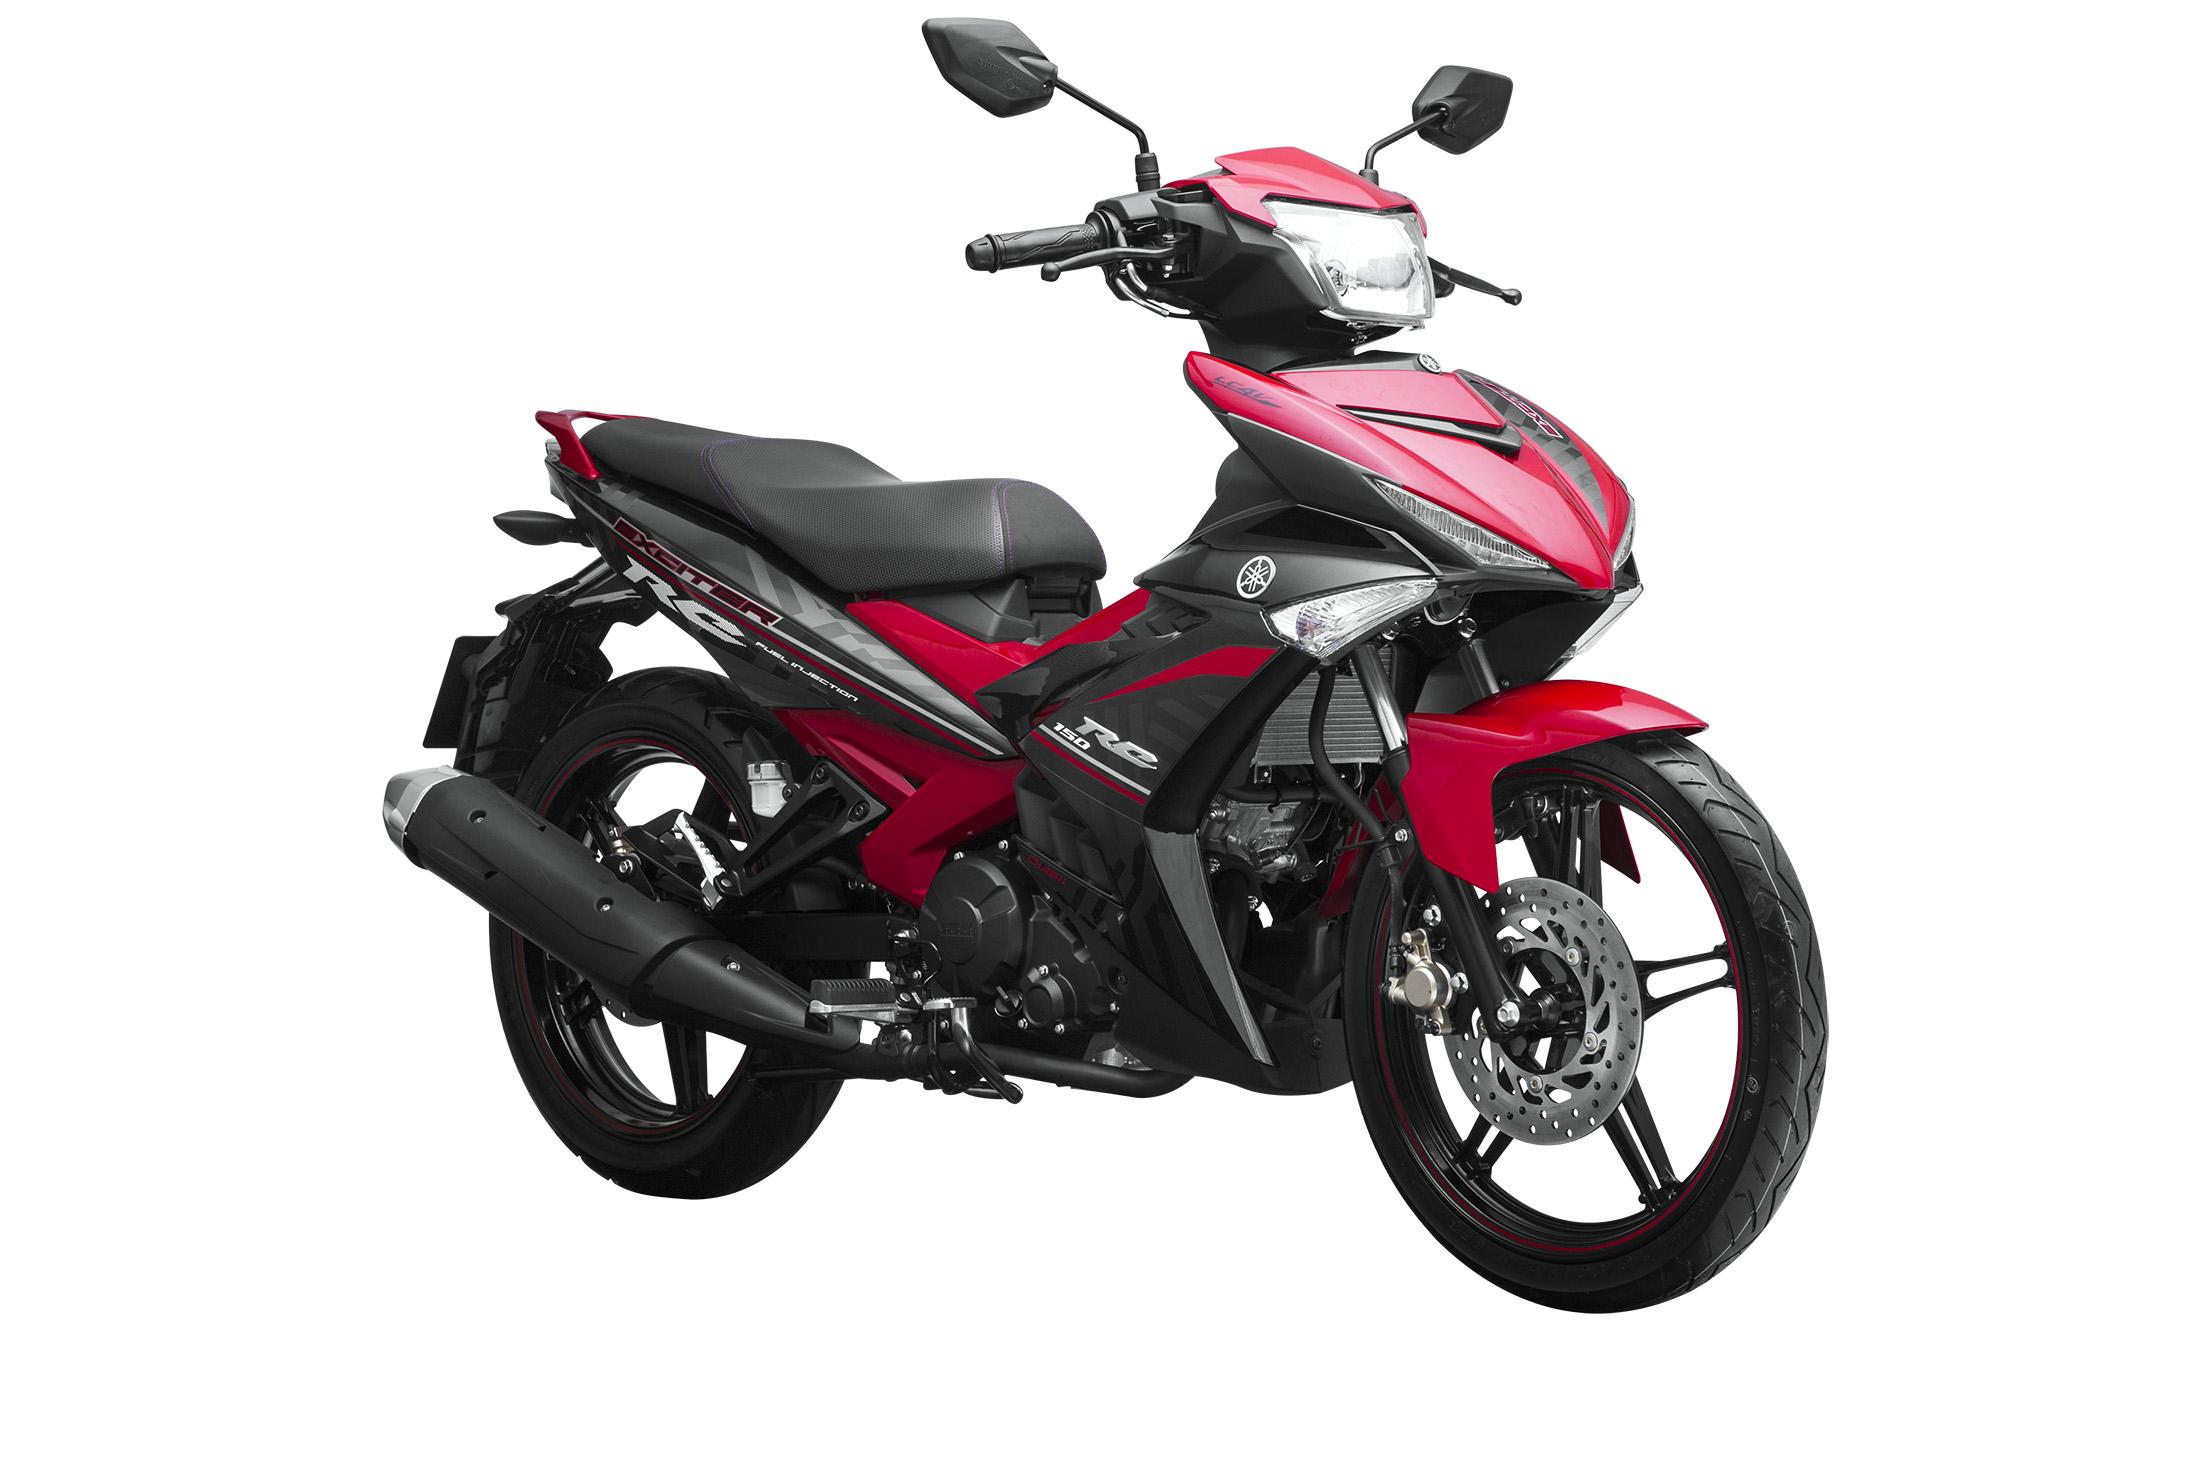 Gambar Yamaha Jupiter MX King 150 cc Warna Merah